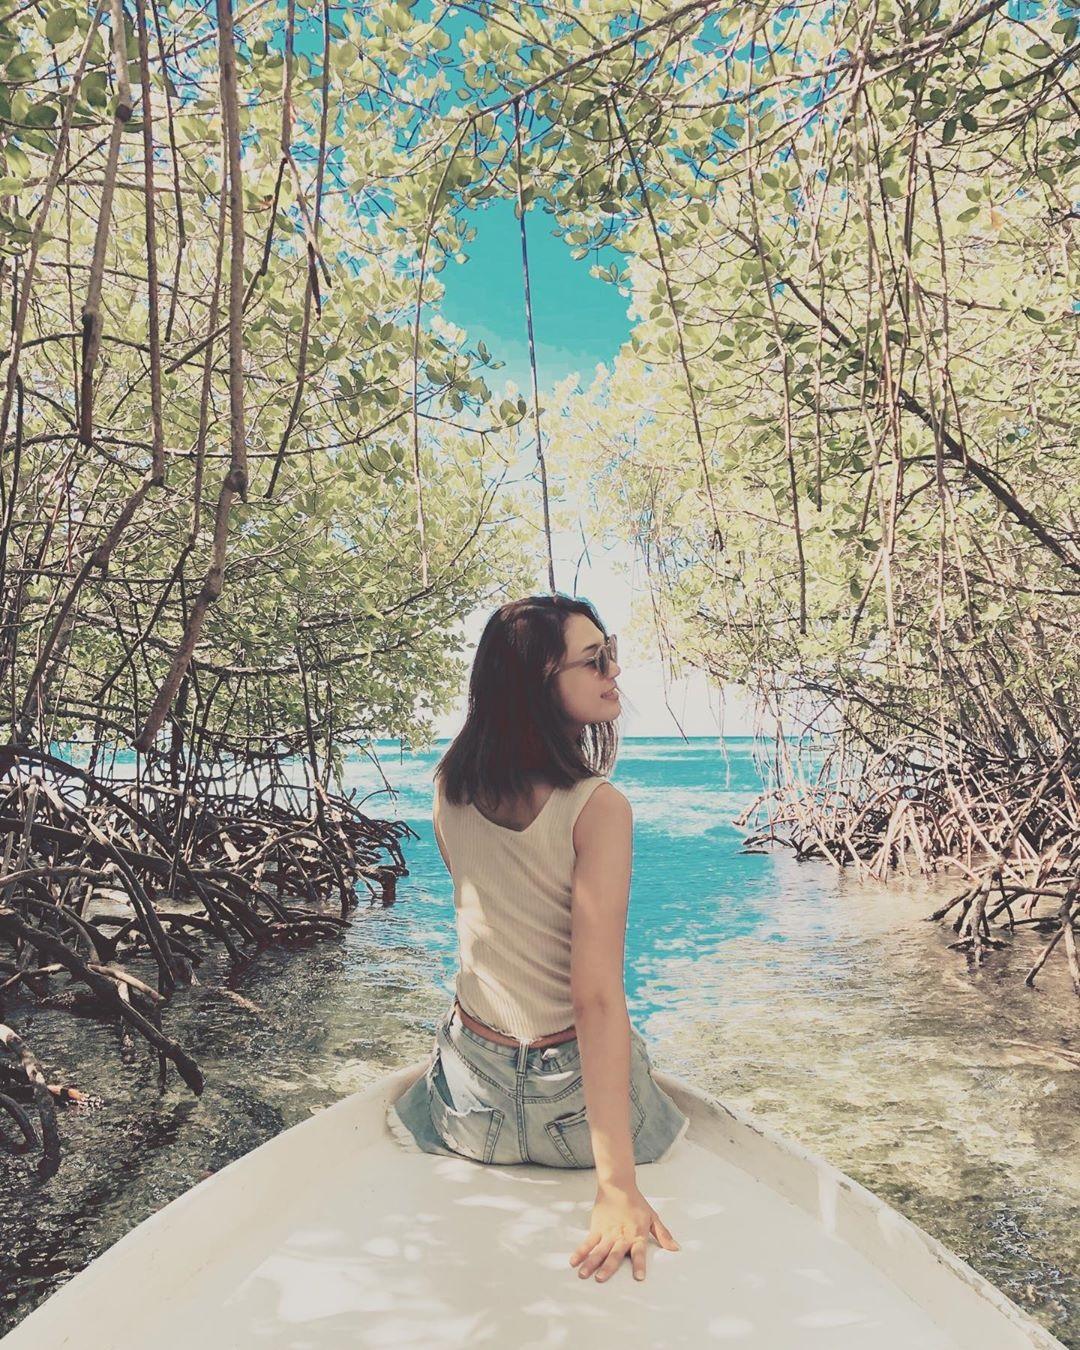 mangrove forest at nusa lembongan